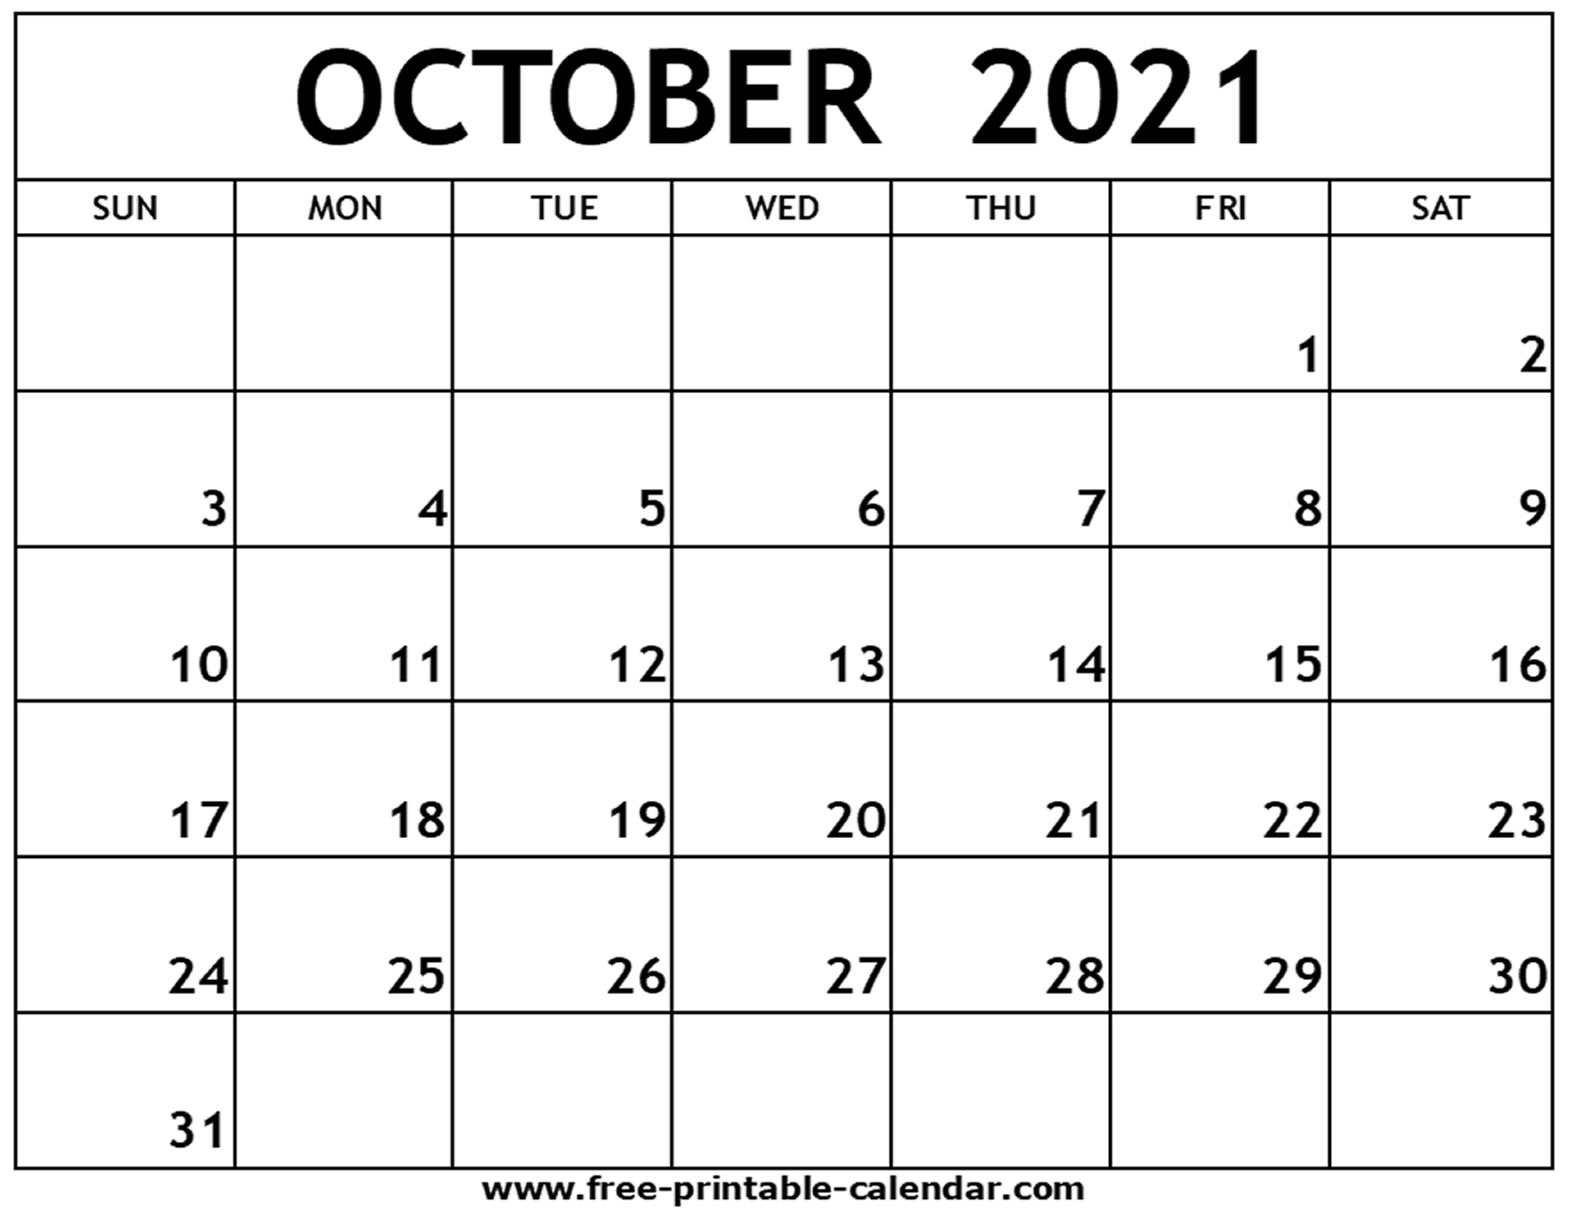 Collect October 2021 Calendar